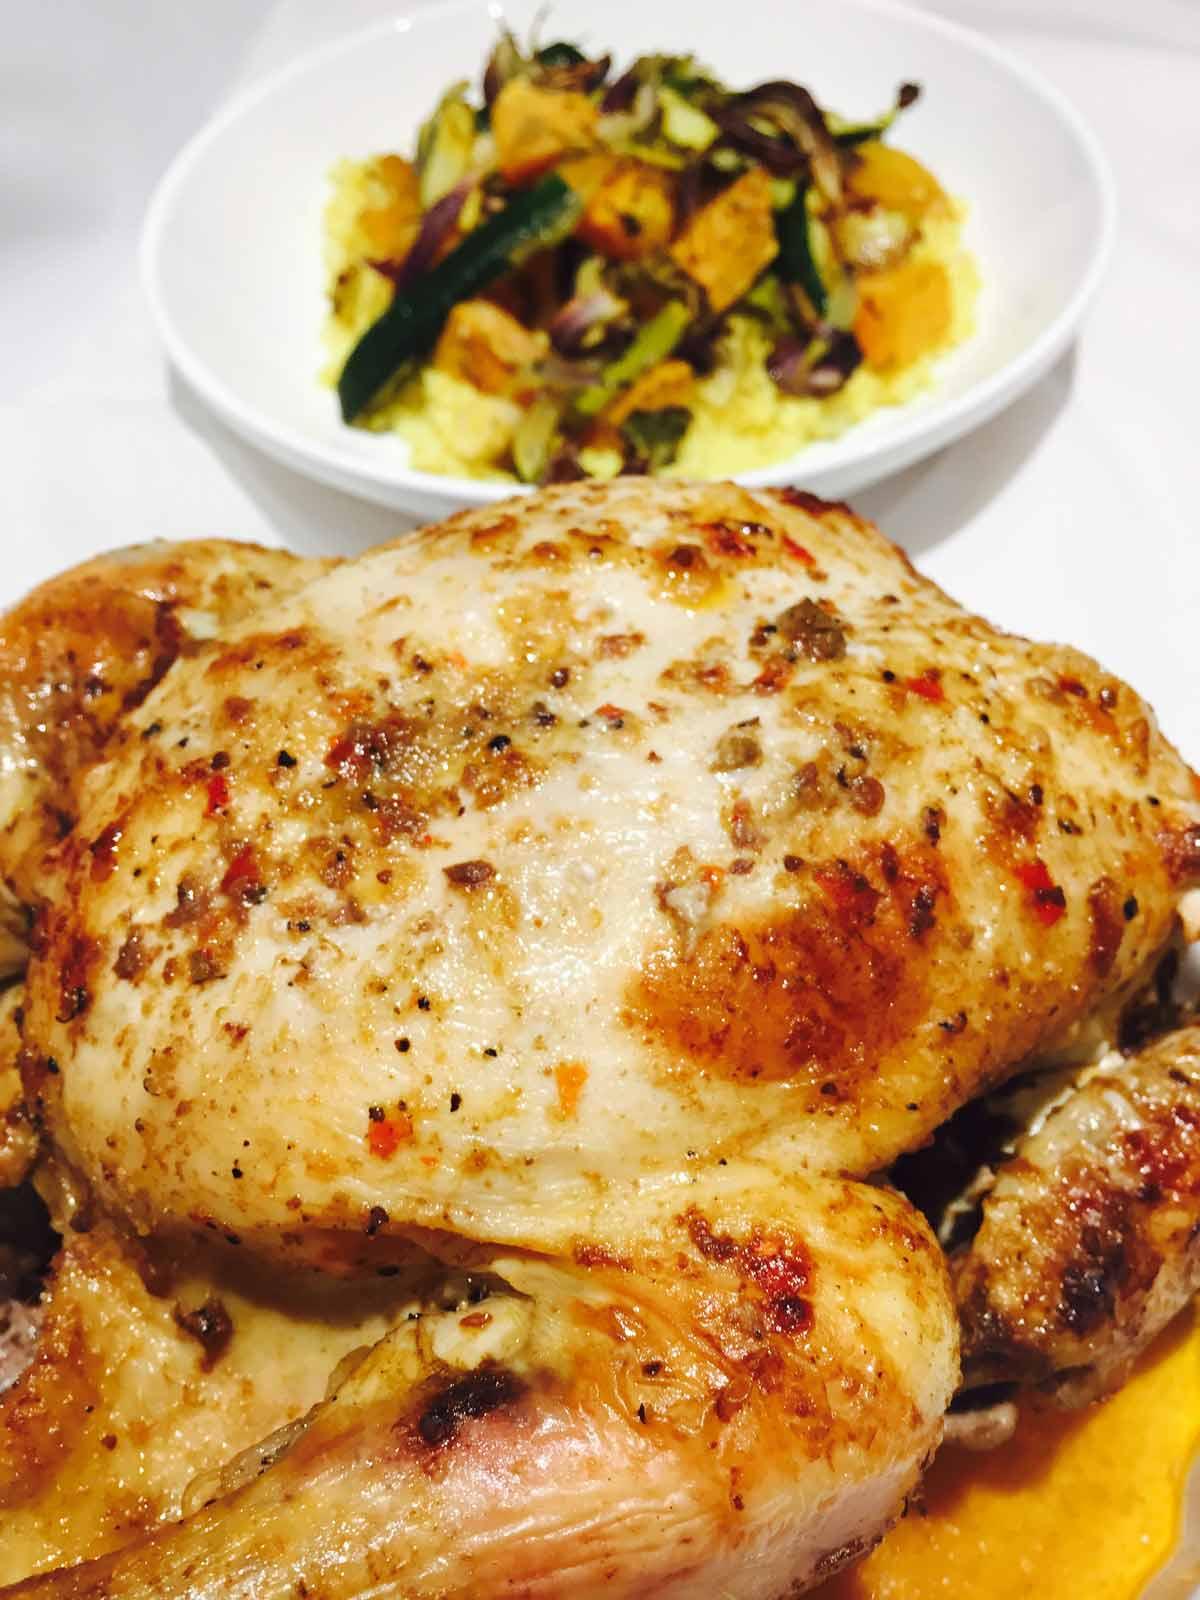 Crispy thai roast chicken, whole